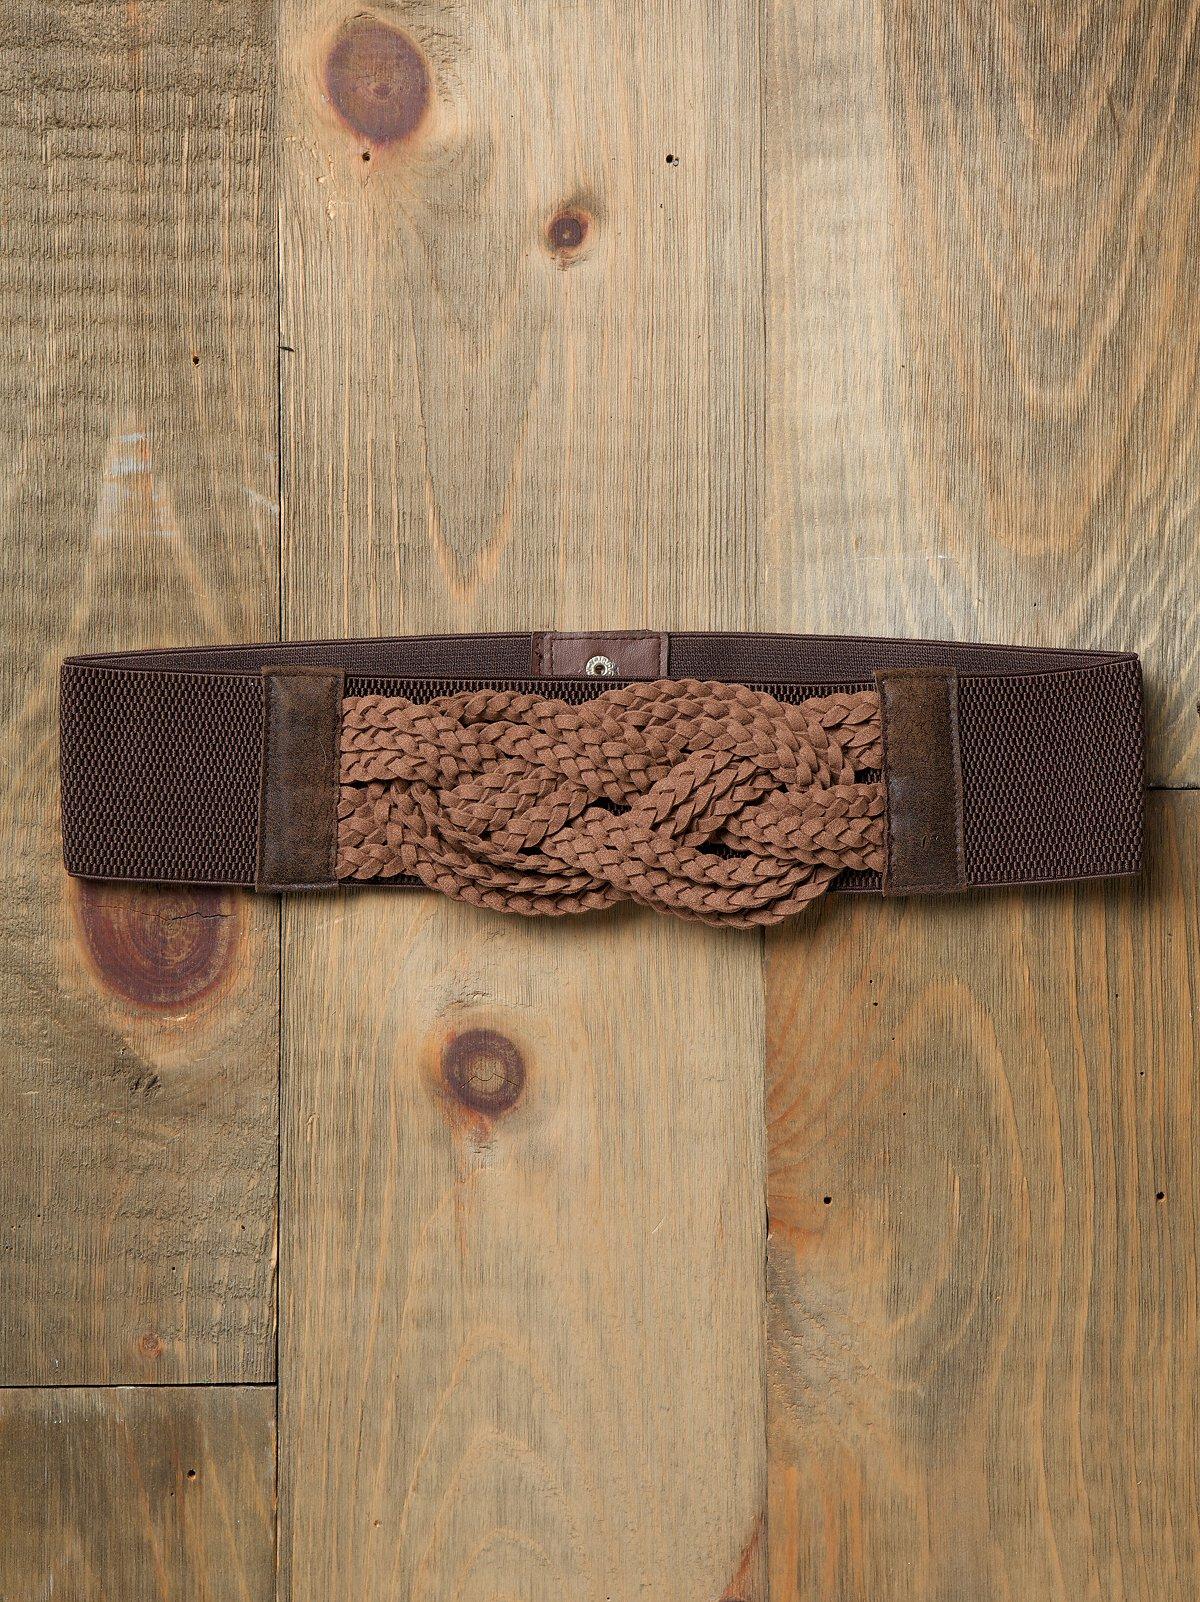 Knotted Stretch Waist Belt